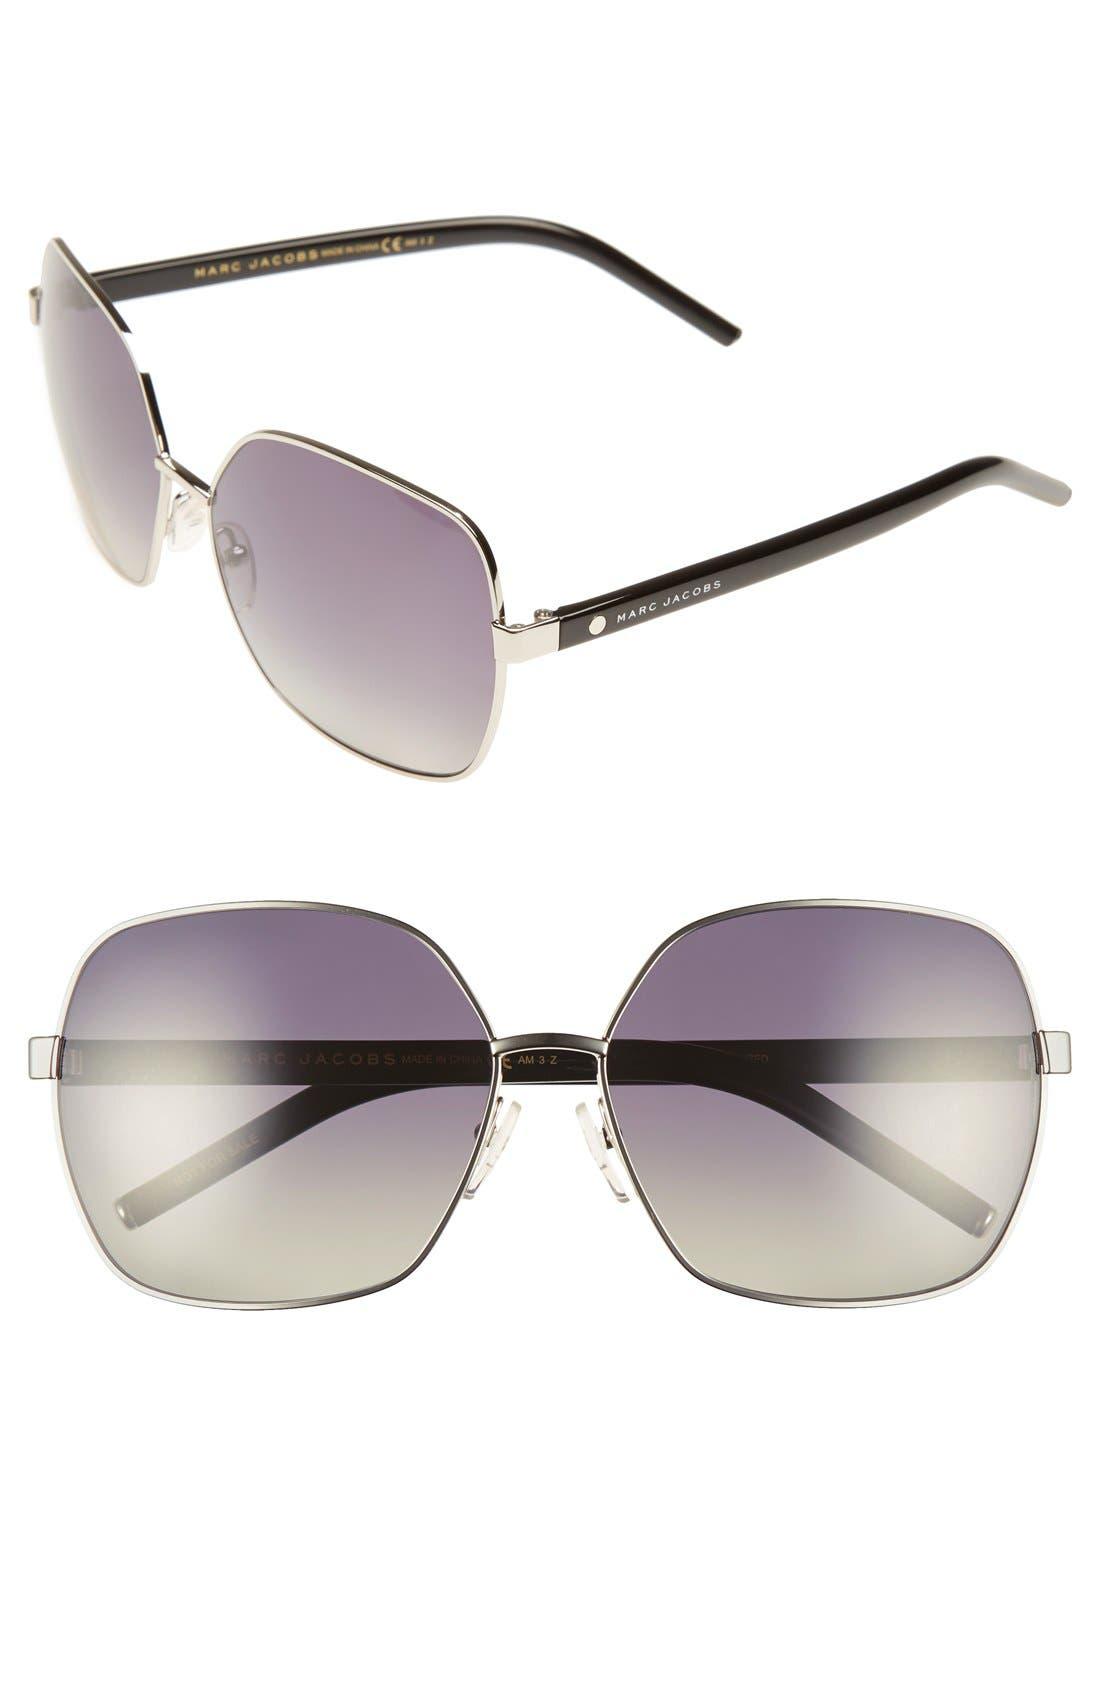 61mm Polarized Oversized Sunglasses,                             Main thumbnail 1, color,                             Palladium/ Black